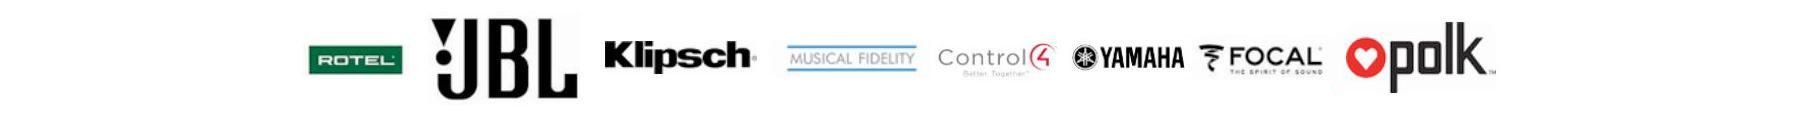 Logo of Rotel, JBL, Klipsch, Musical Fidelity, Control4, Yamaha, Focal, Polk